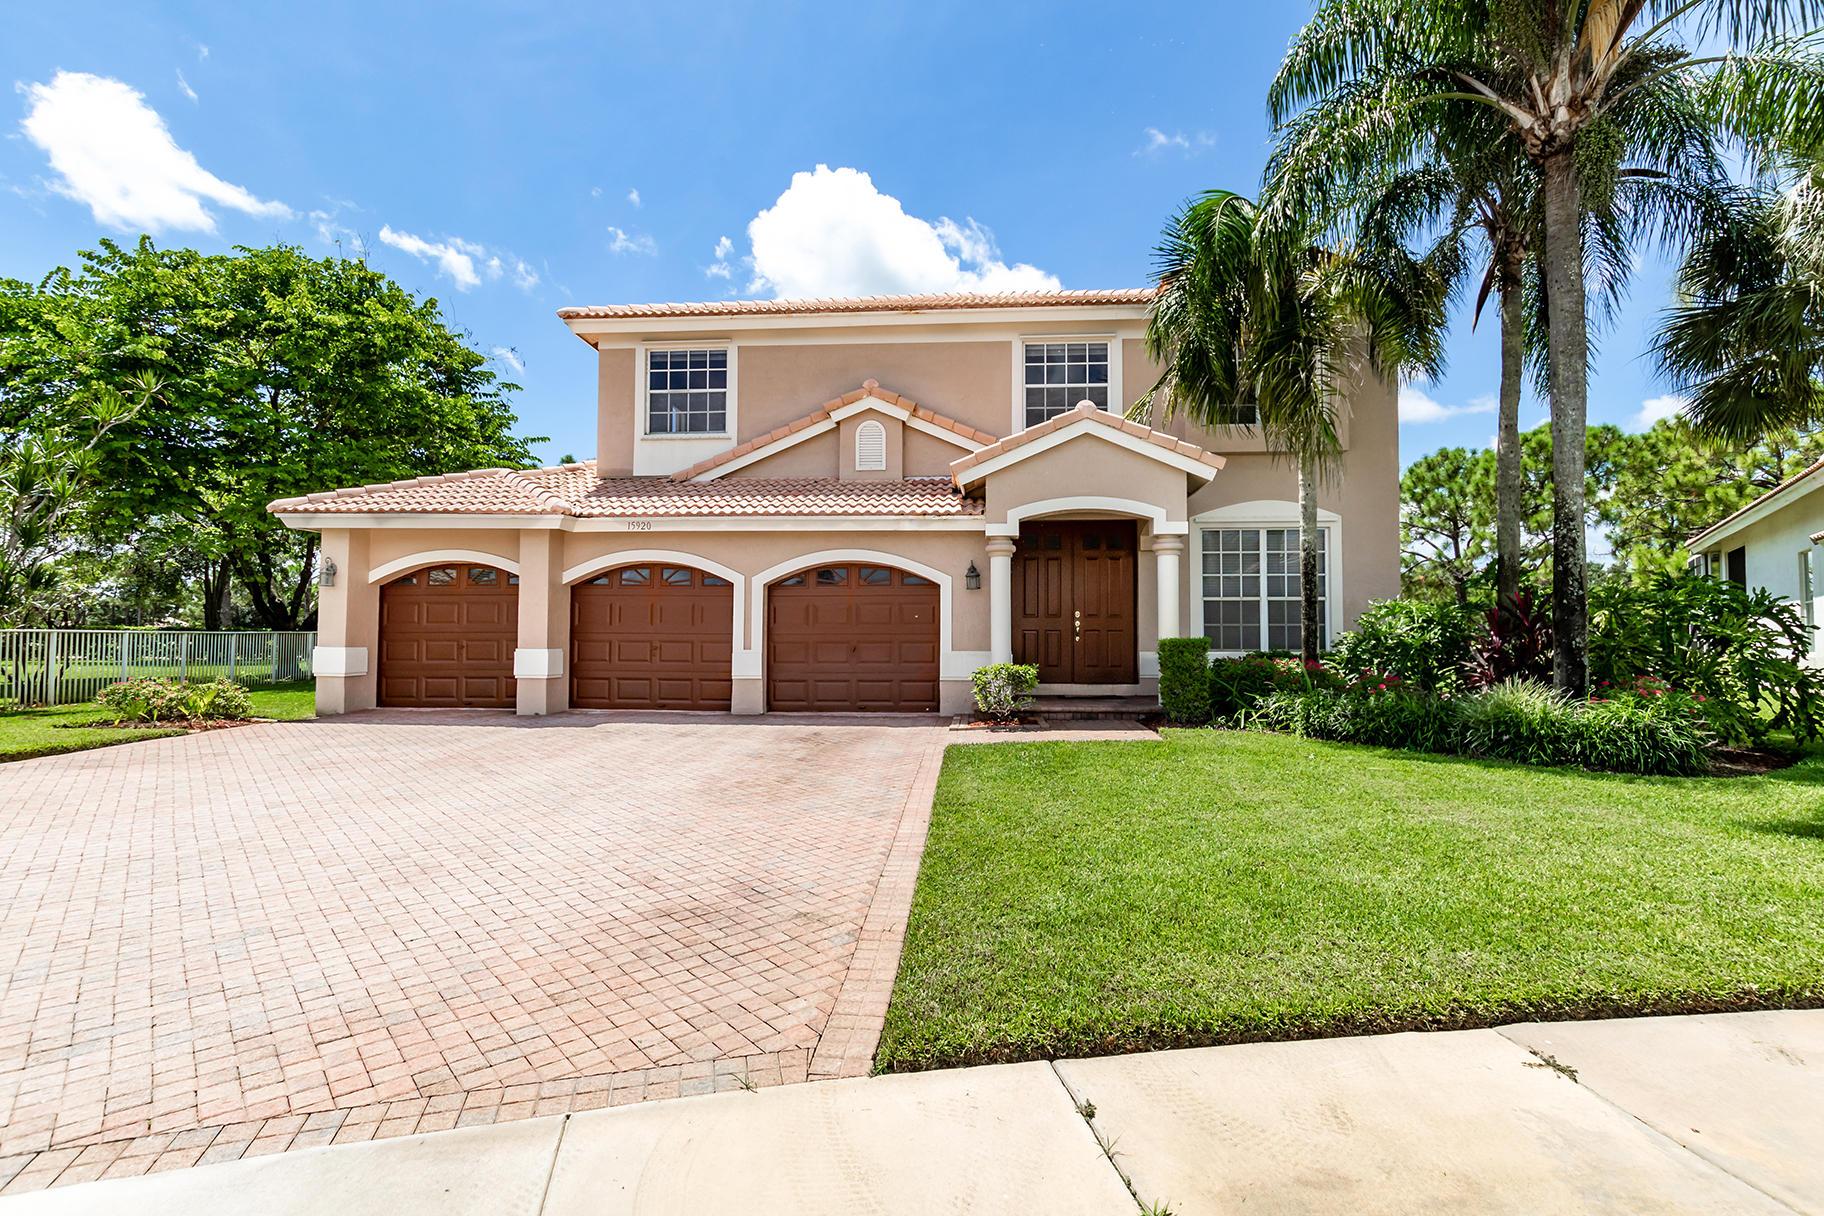 15920 Lisbon Court, Wellington, Florida 33414, 5 Bedrooms Bedrooms, ,3 BathroomsBathrooms,Single Family,For Sale,LAKEFIELD WEST,Lisbon,RX-10554585